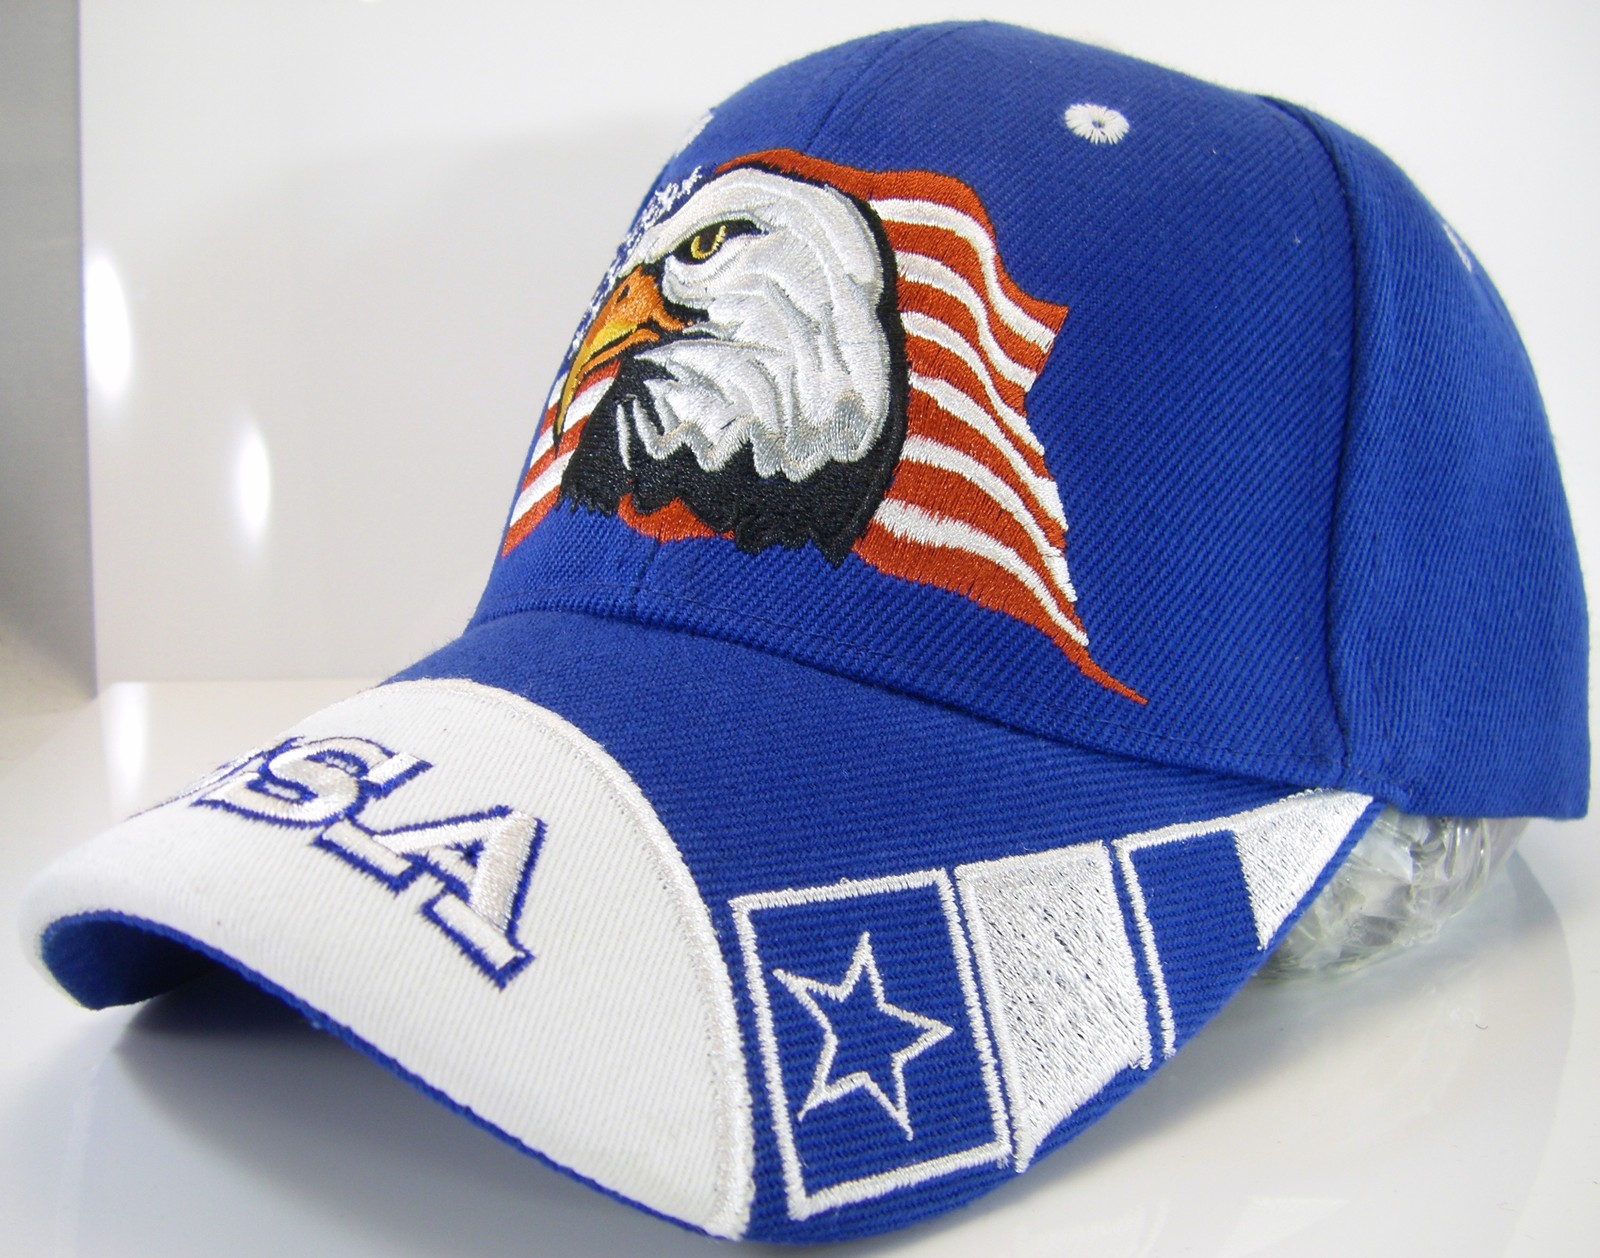 43d23bbedd101 USA American Flag   Bald Eagle Patriotic Men s Adjustable Baseball Cap Hat  ROYAL